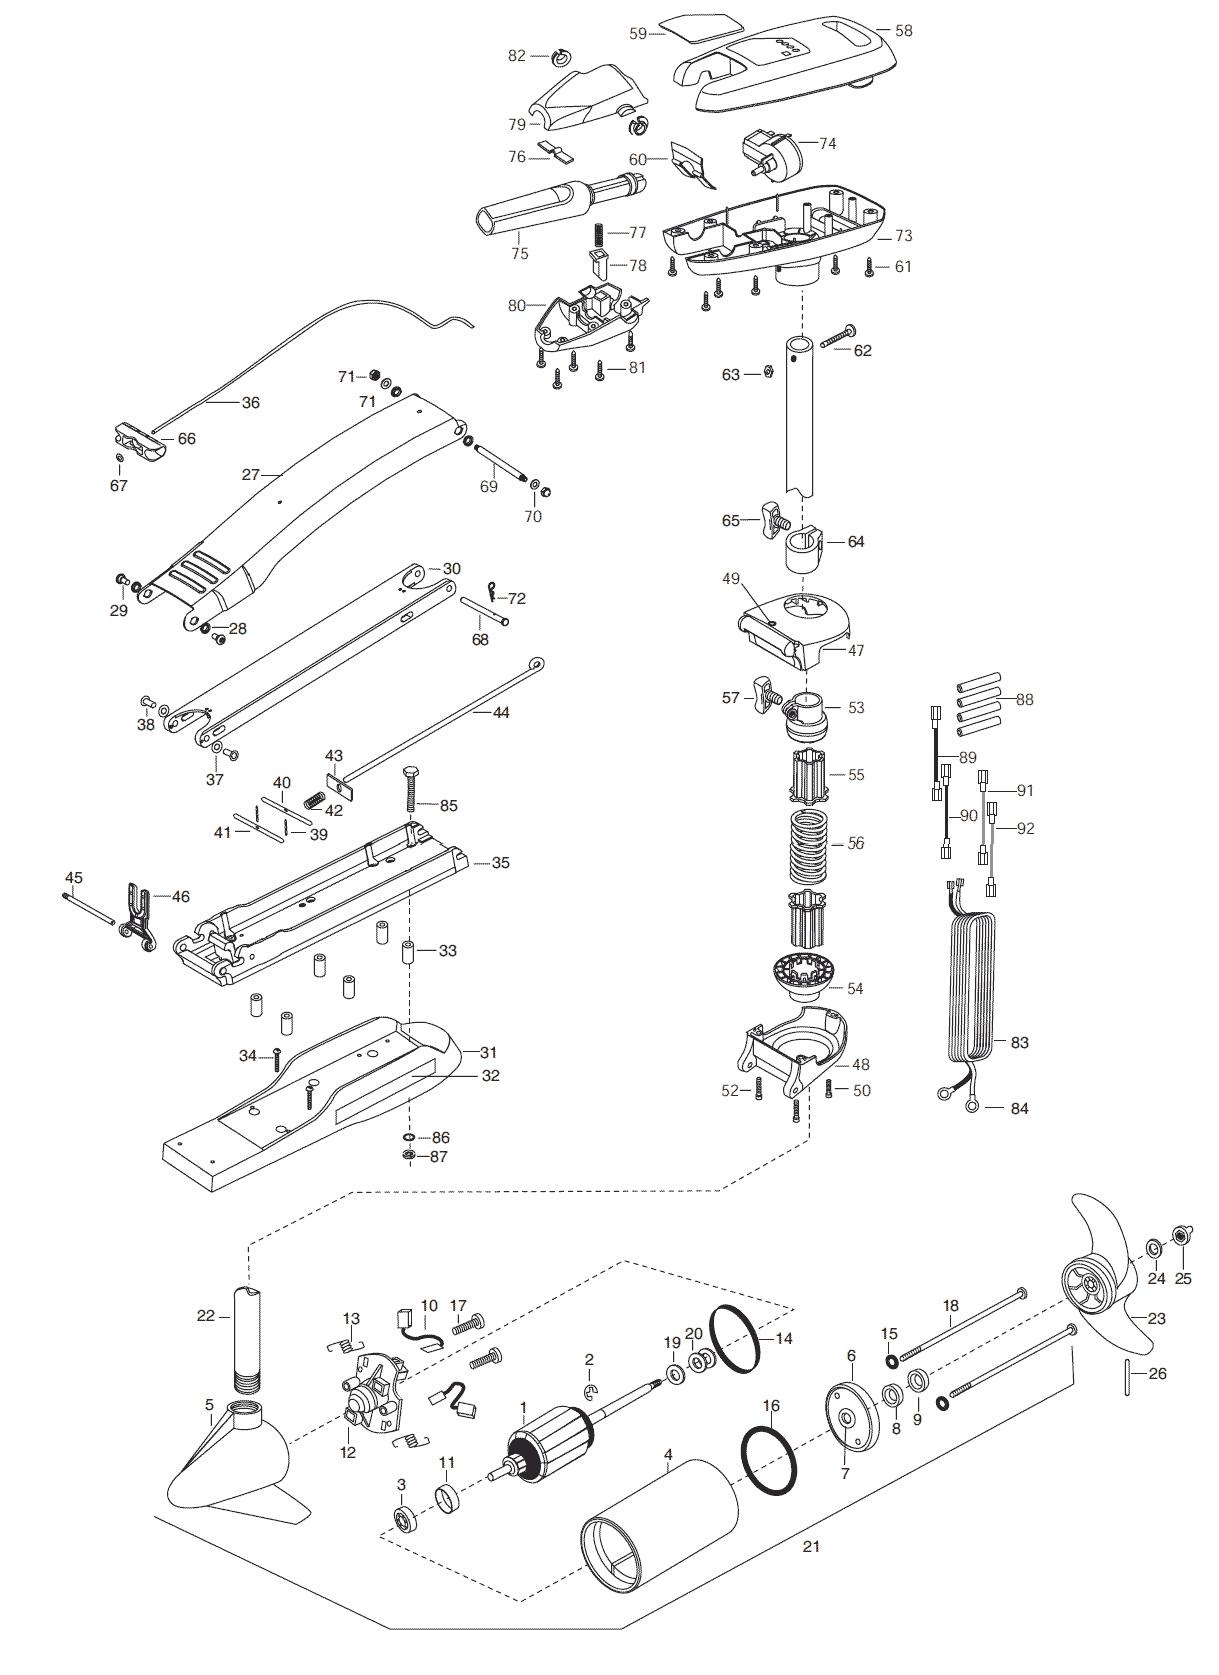 Minn Kota Riptide 55 Sc B 52 Inch Parts